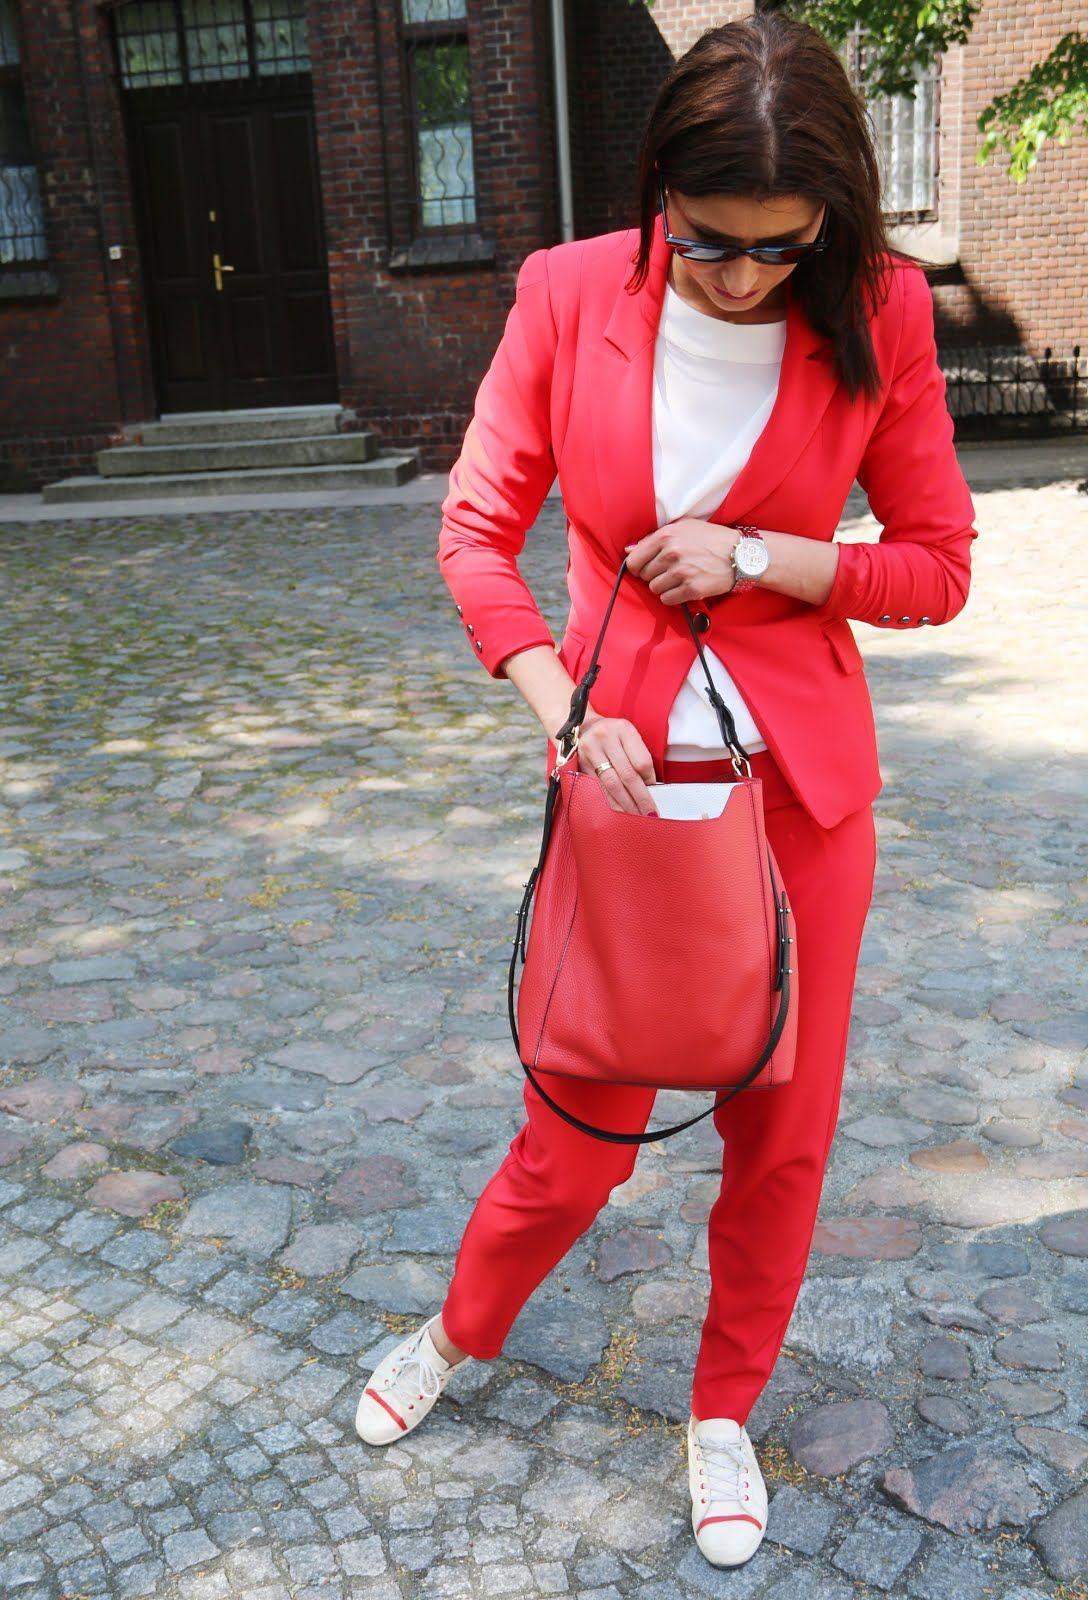 Office Style Czerwony Garnitur I Biale Trampki Fashion Style Red Leather